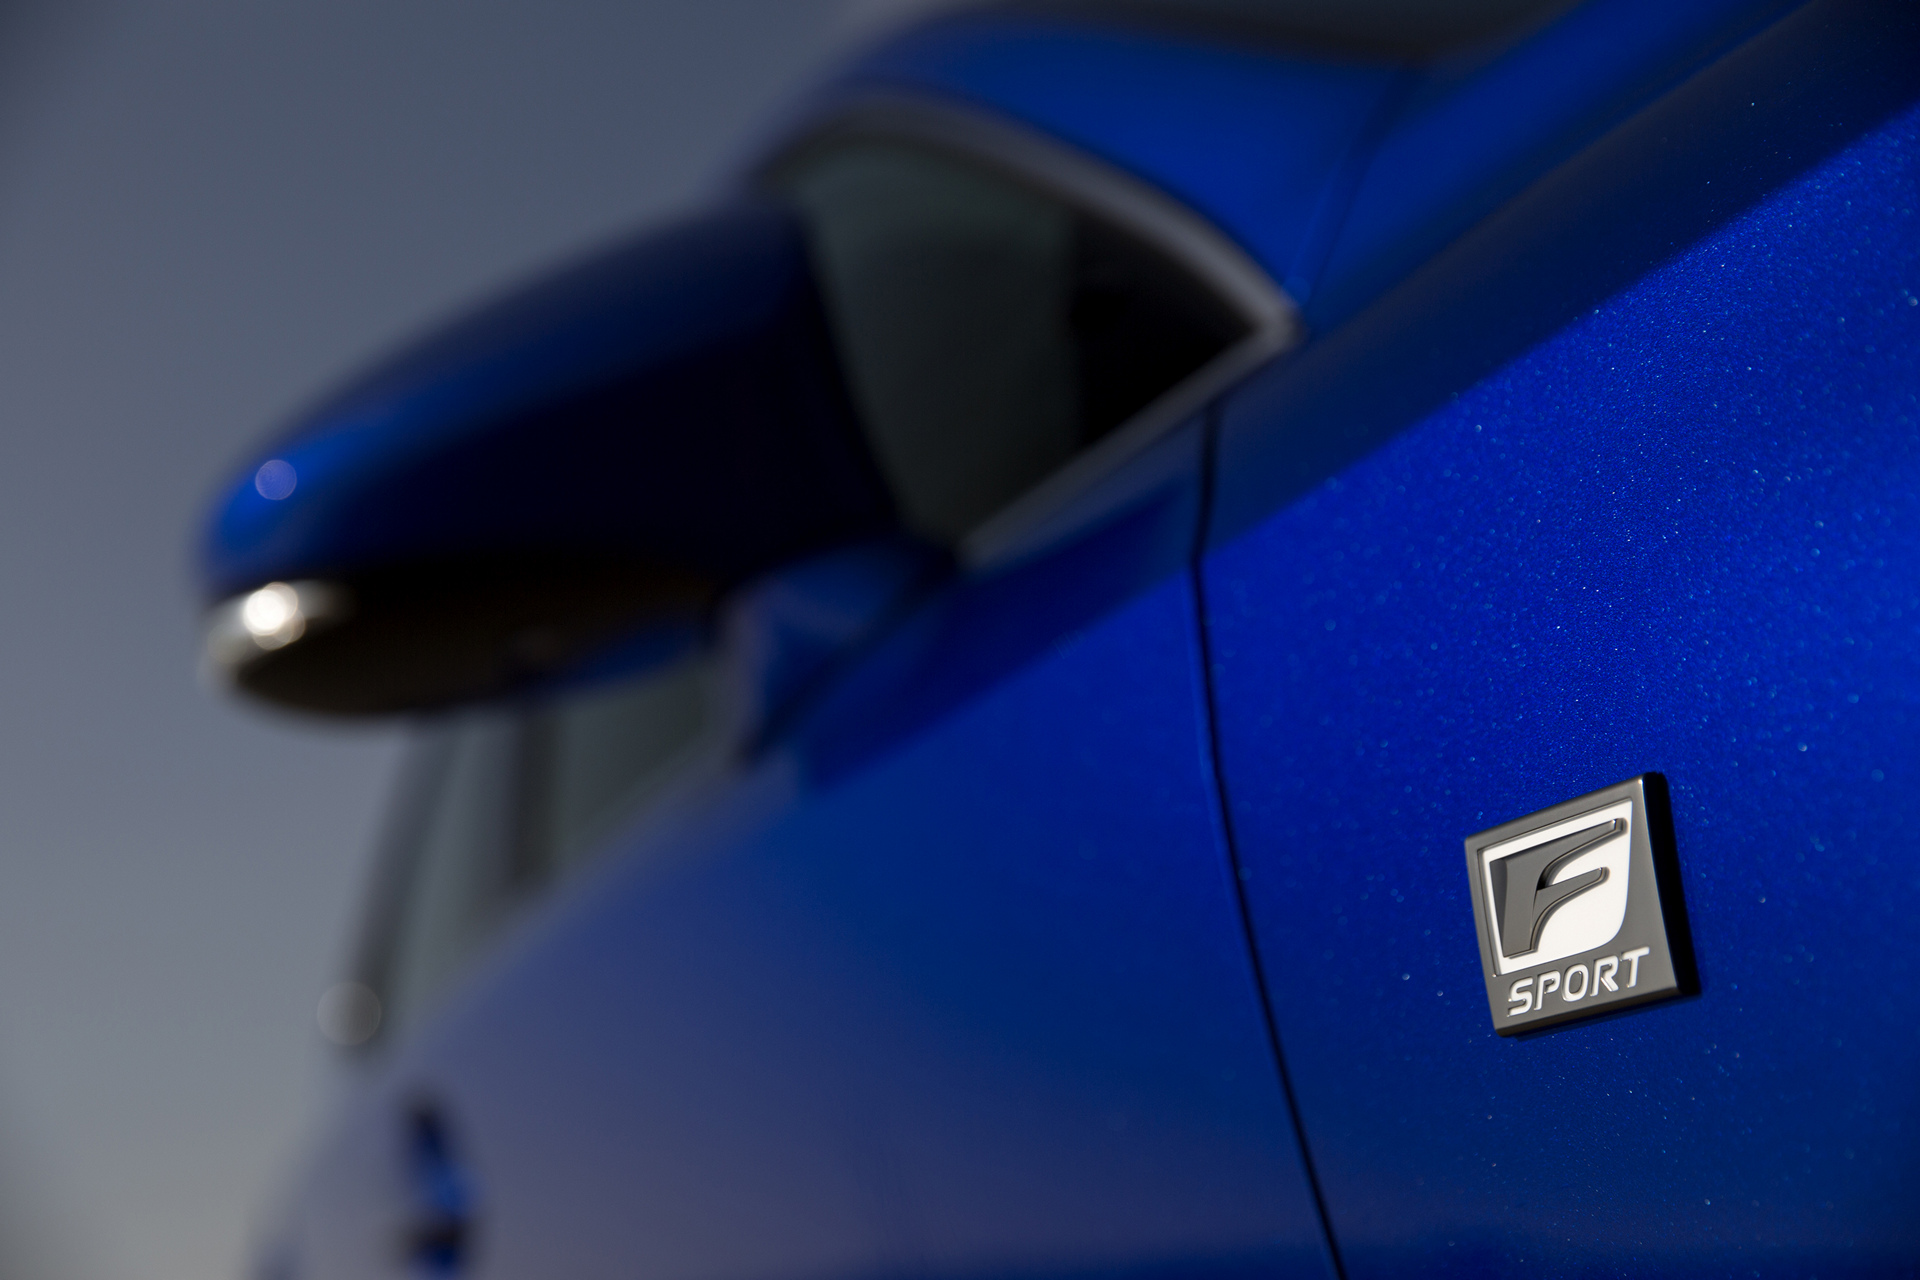 2017 Lexus IS 350 F SPORT © Toyota Motor Corporation